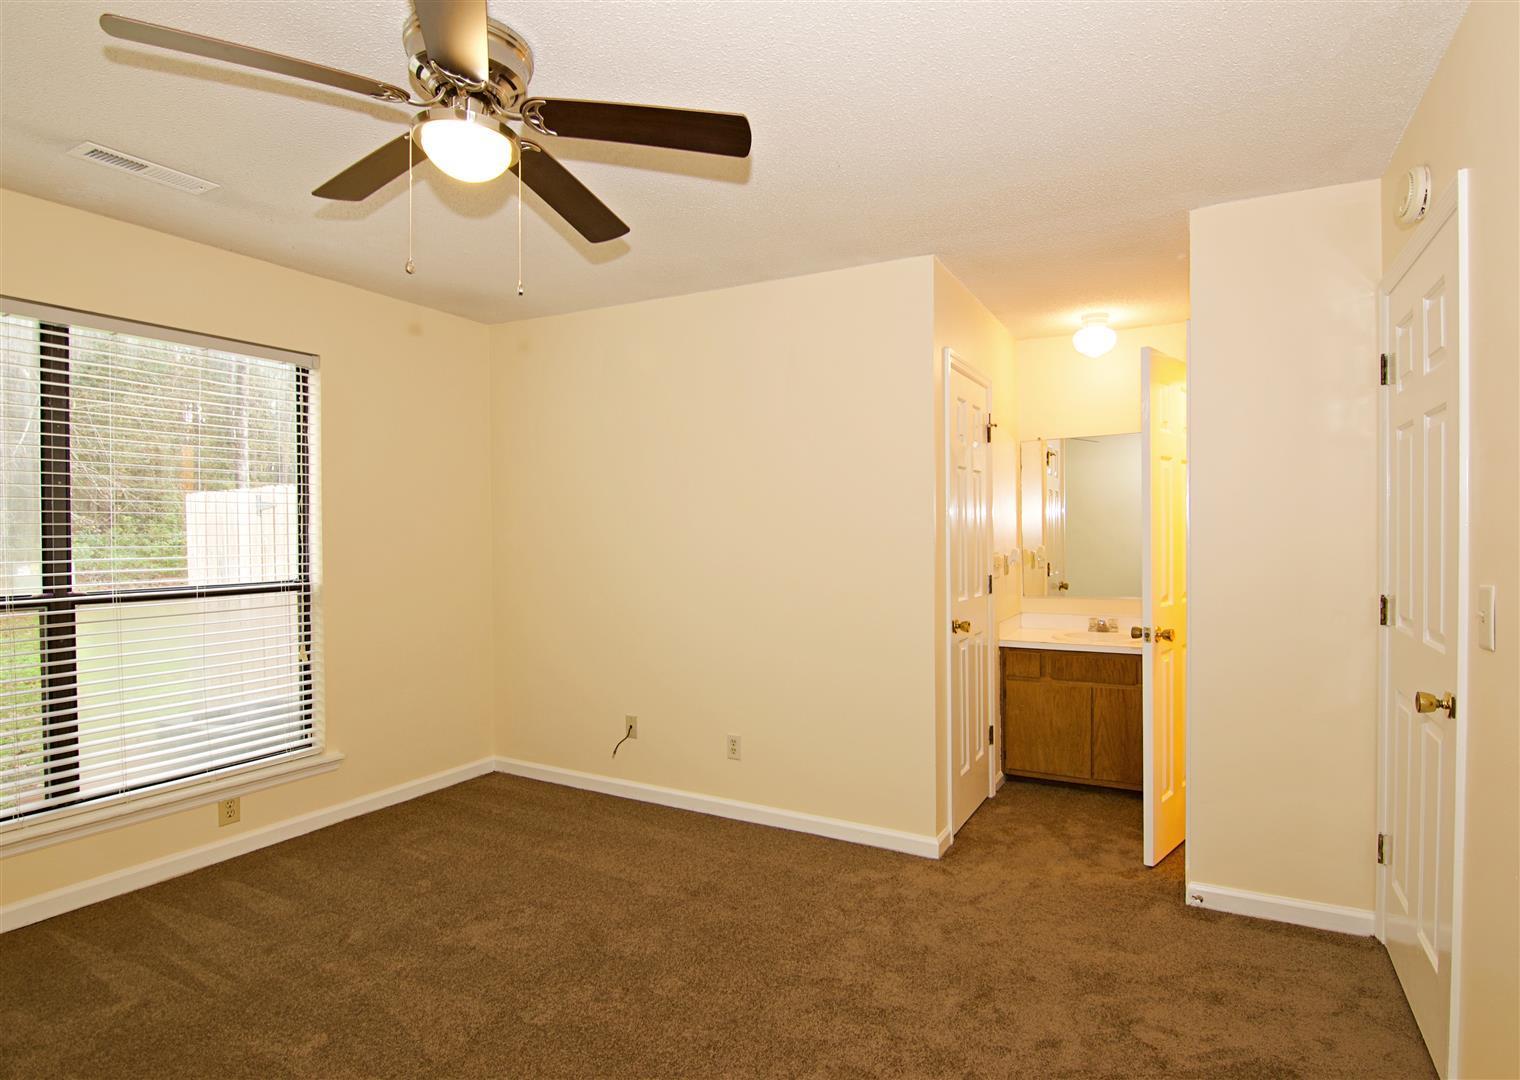 Shaftesbury Woods Homes For Sale - 931 Estates, Charleston, SC - 8